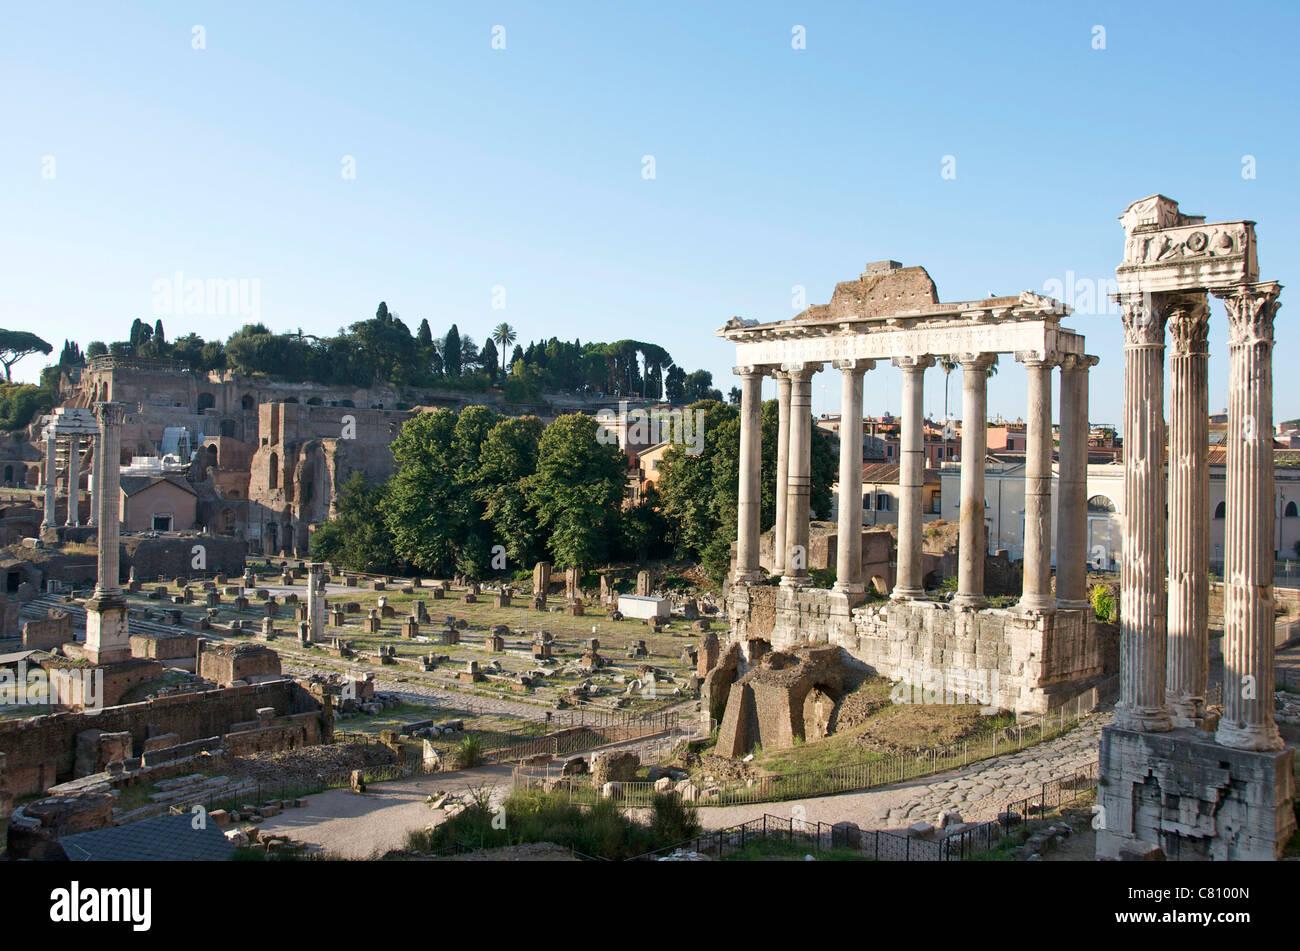 File:Temple Vesta Forum Romanum Rome Italy.jpg - Wikimedia Commons